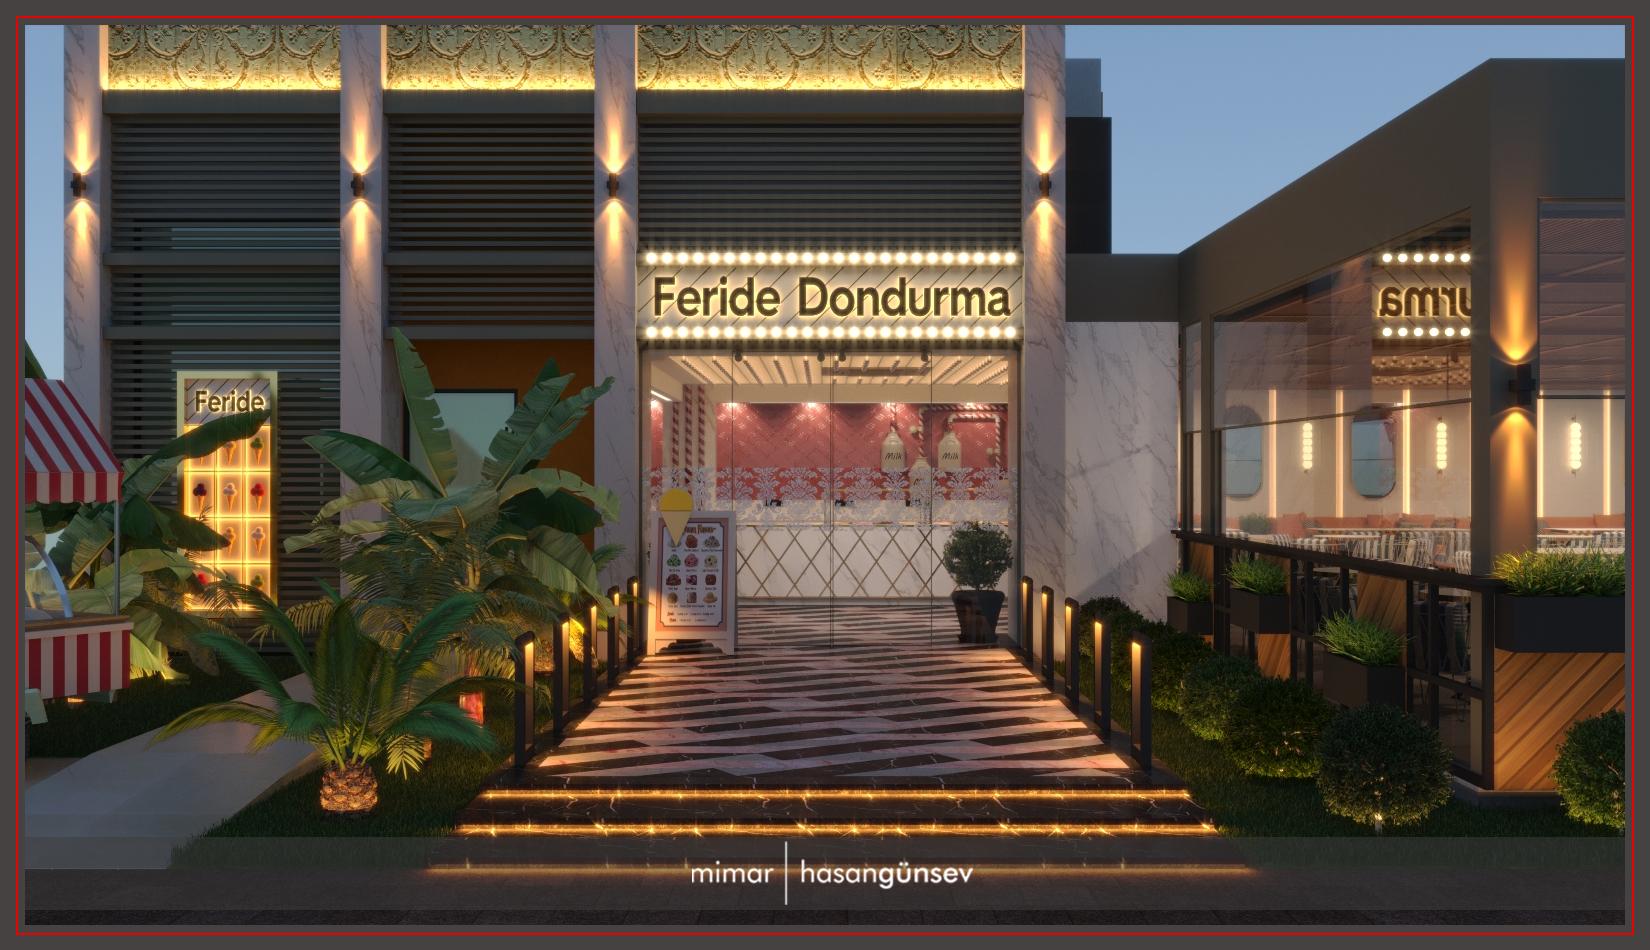 Feride Dondurma